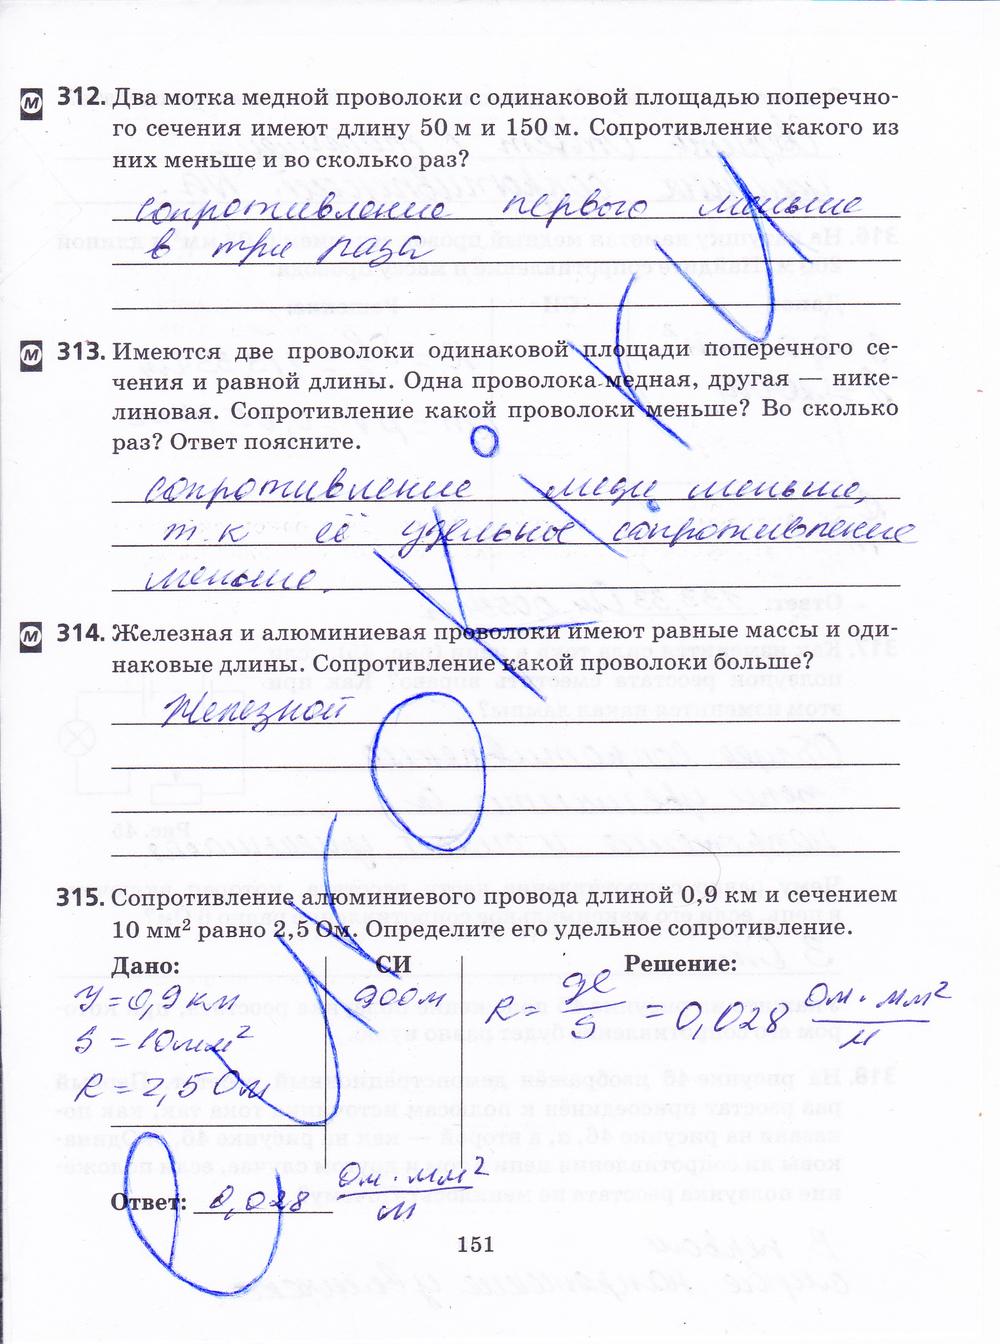 Пурышев Гдз 8 Класс Задание 8